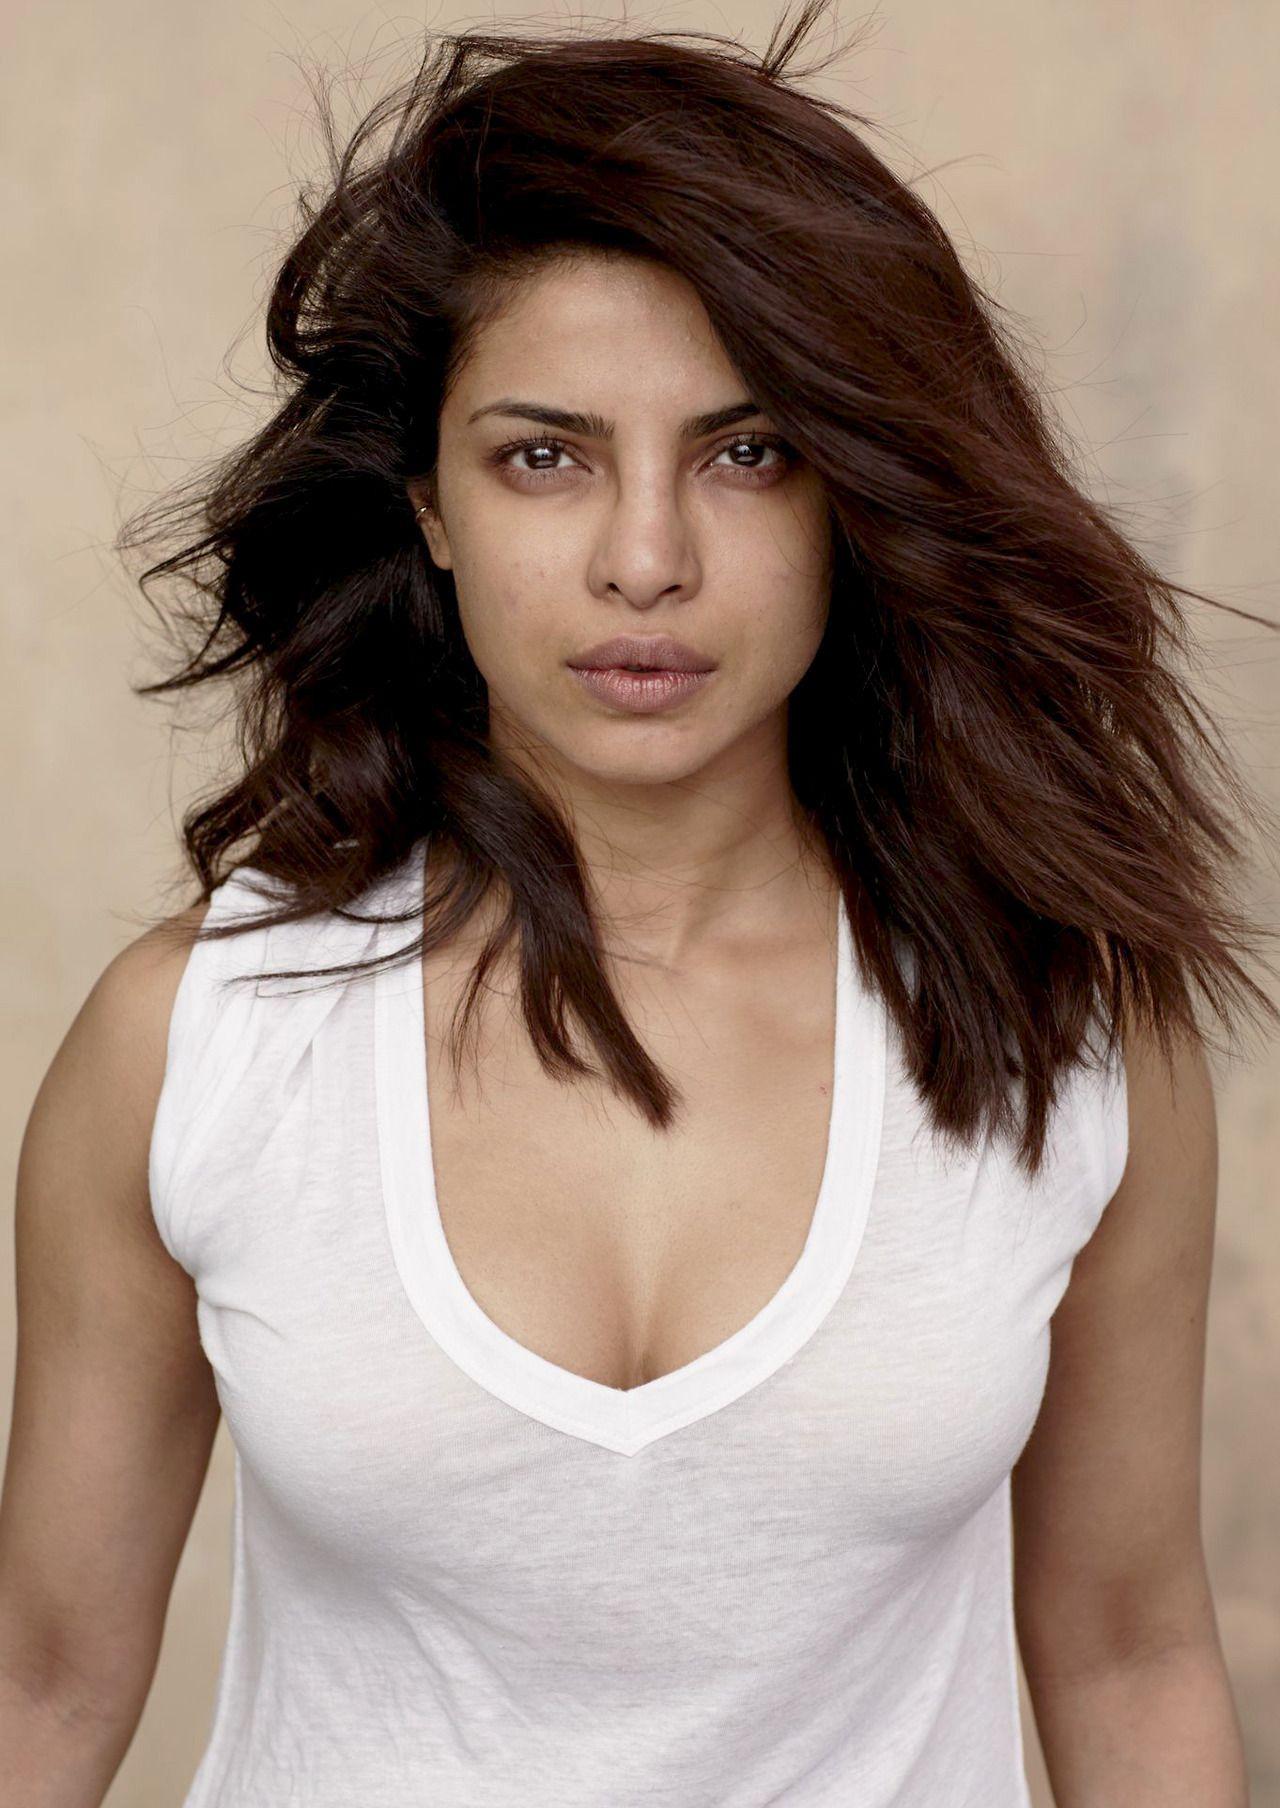 Priyanka Chopra For People Magazine For Worlds Most Beautiful